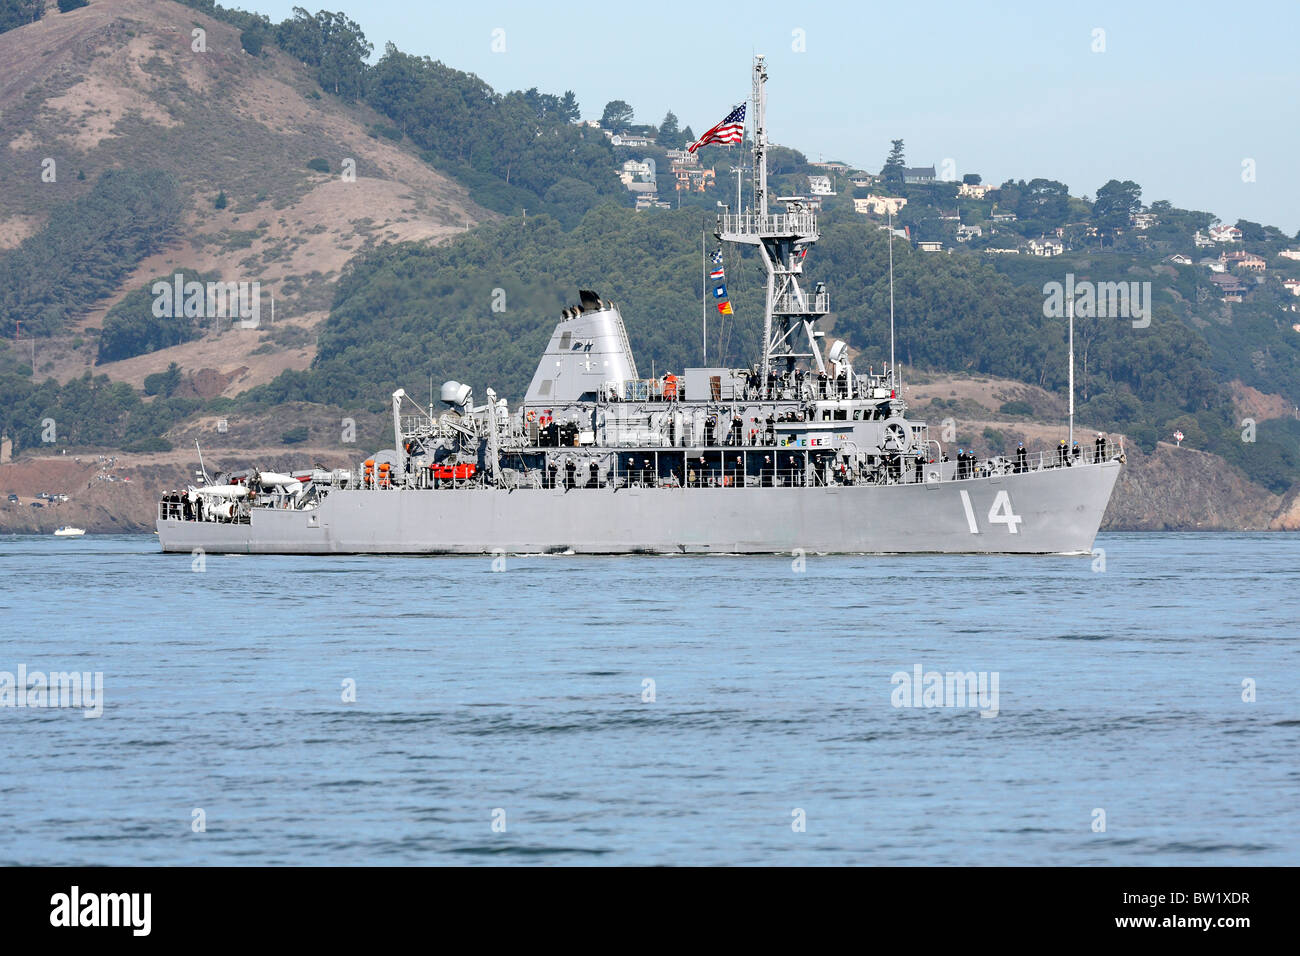 Mine Countermeasure ship USS Chief (MCM 14) on San Francisco Bay. - Stock Image